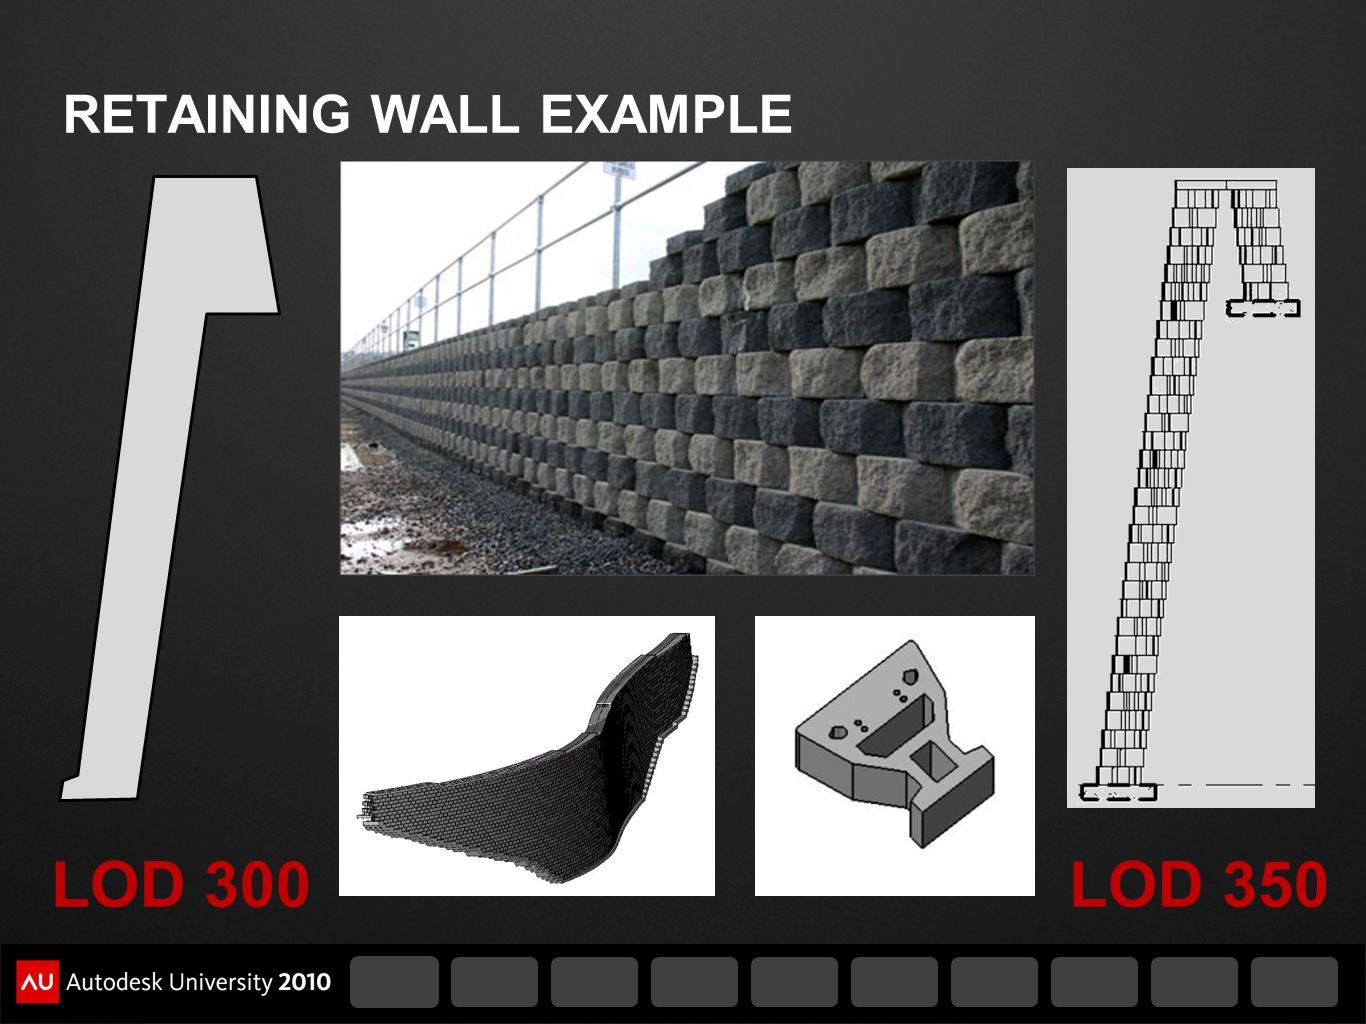 RETAINING WALL EXAMPLE